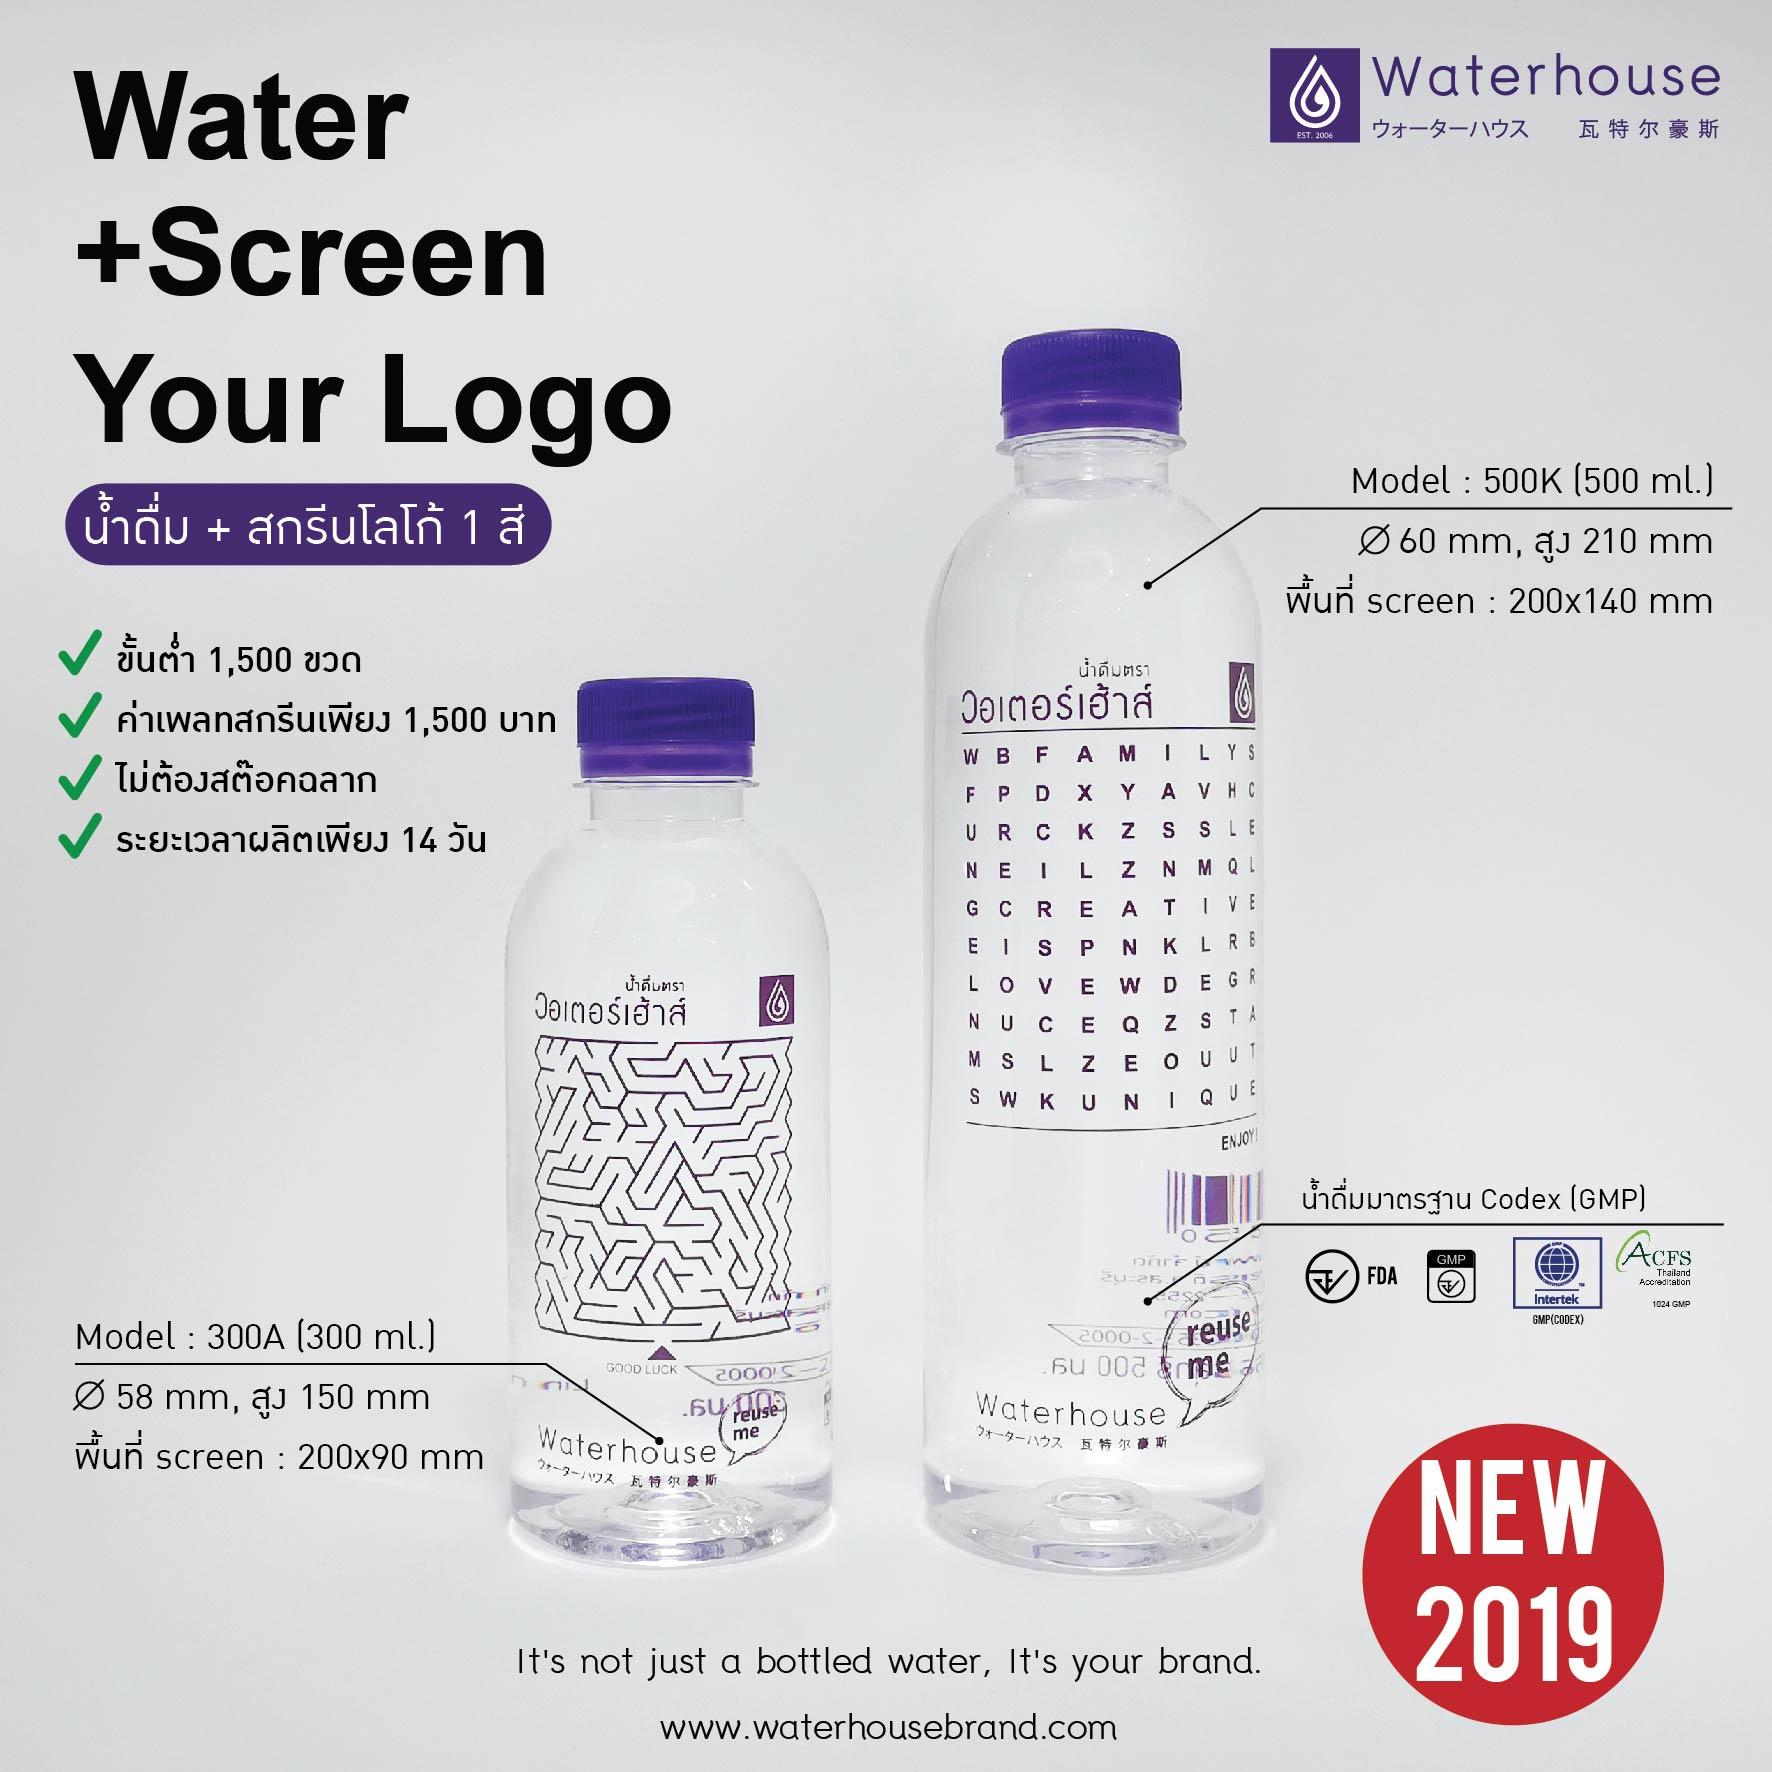 waterhouse น้ำดื่ม screen logo